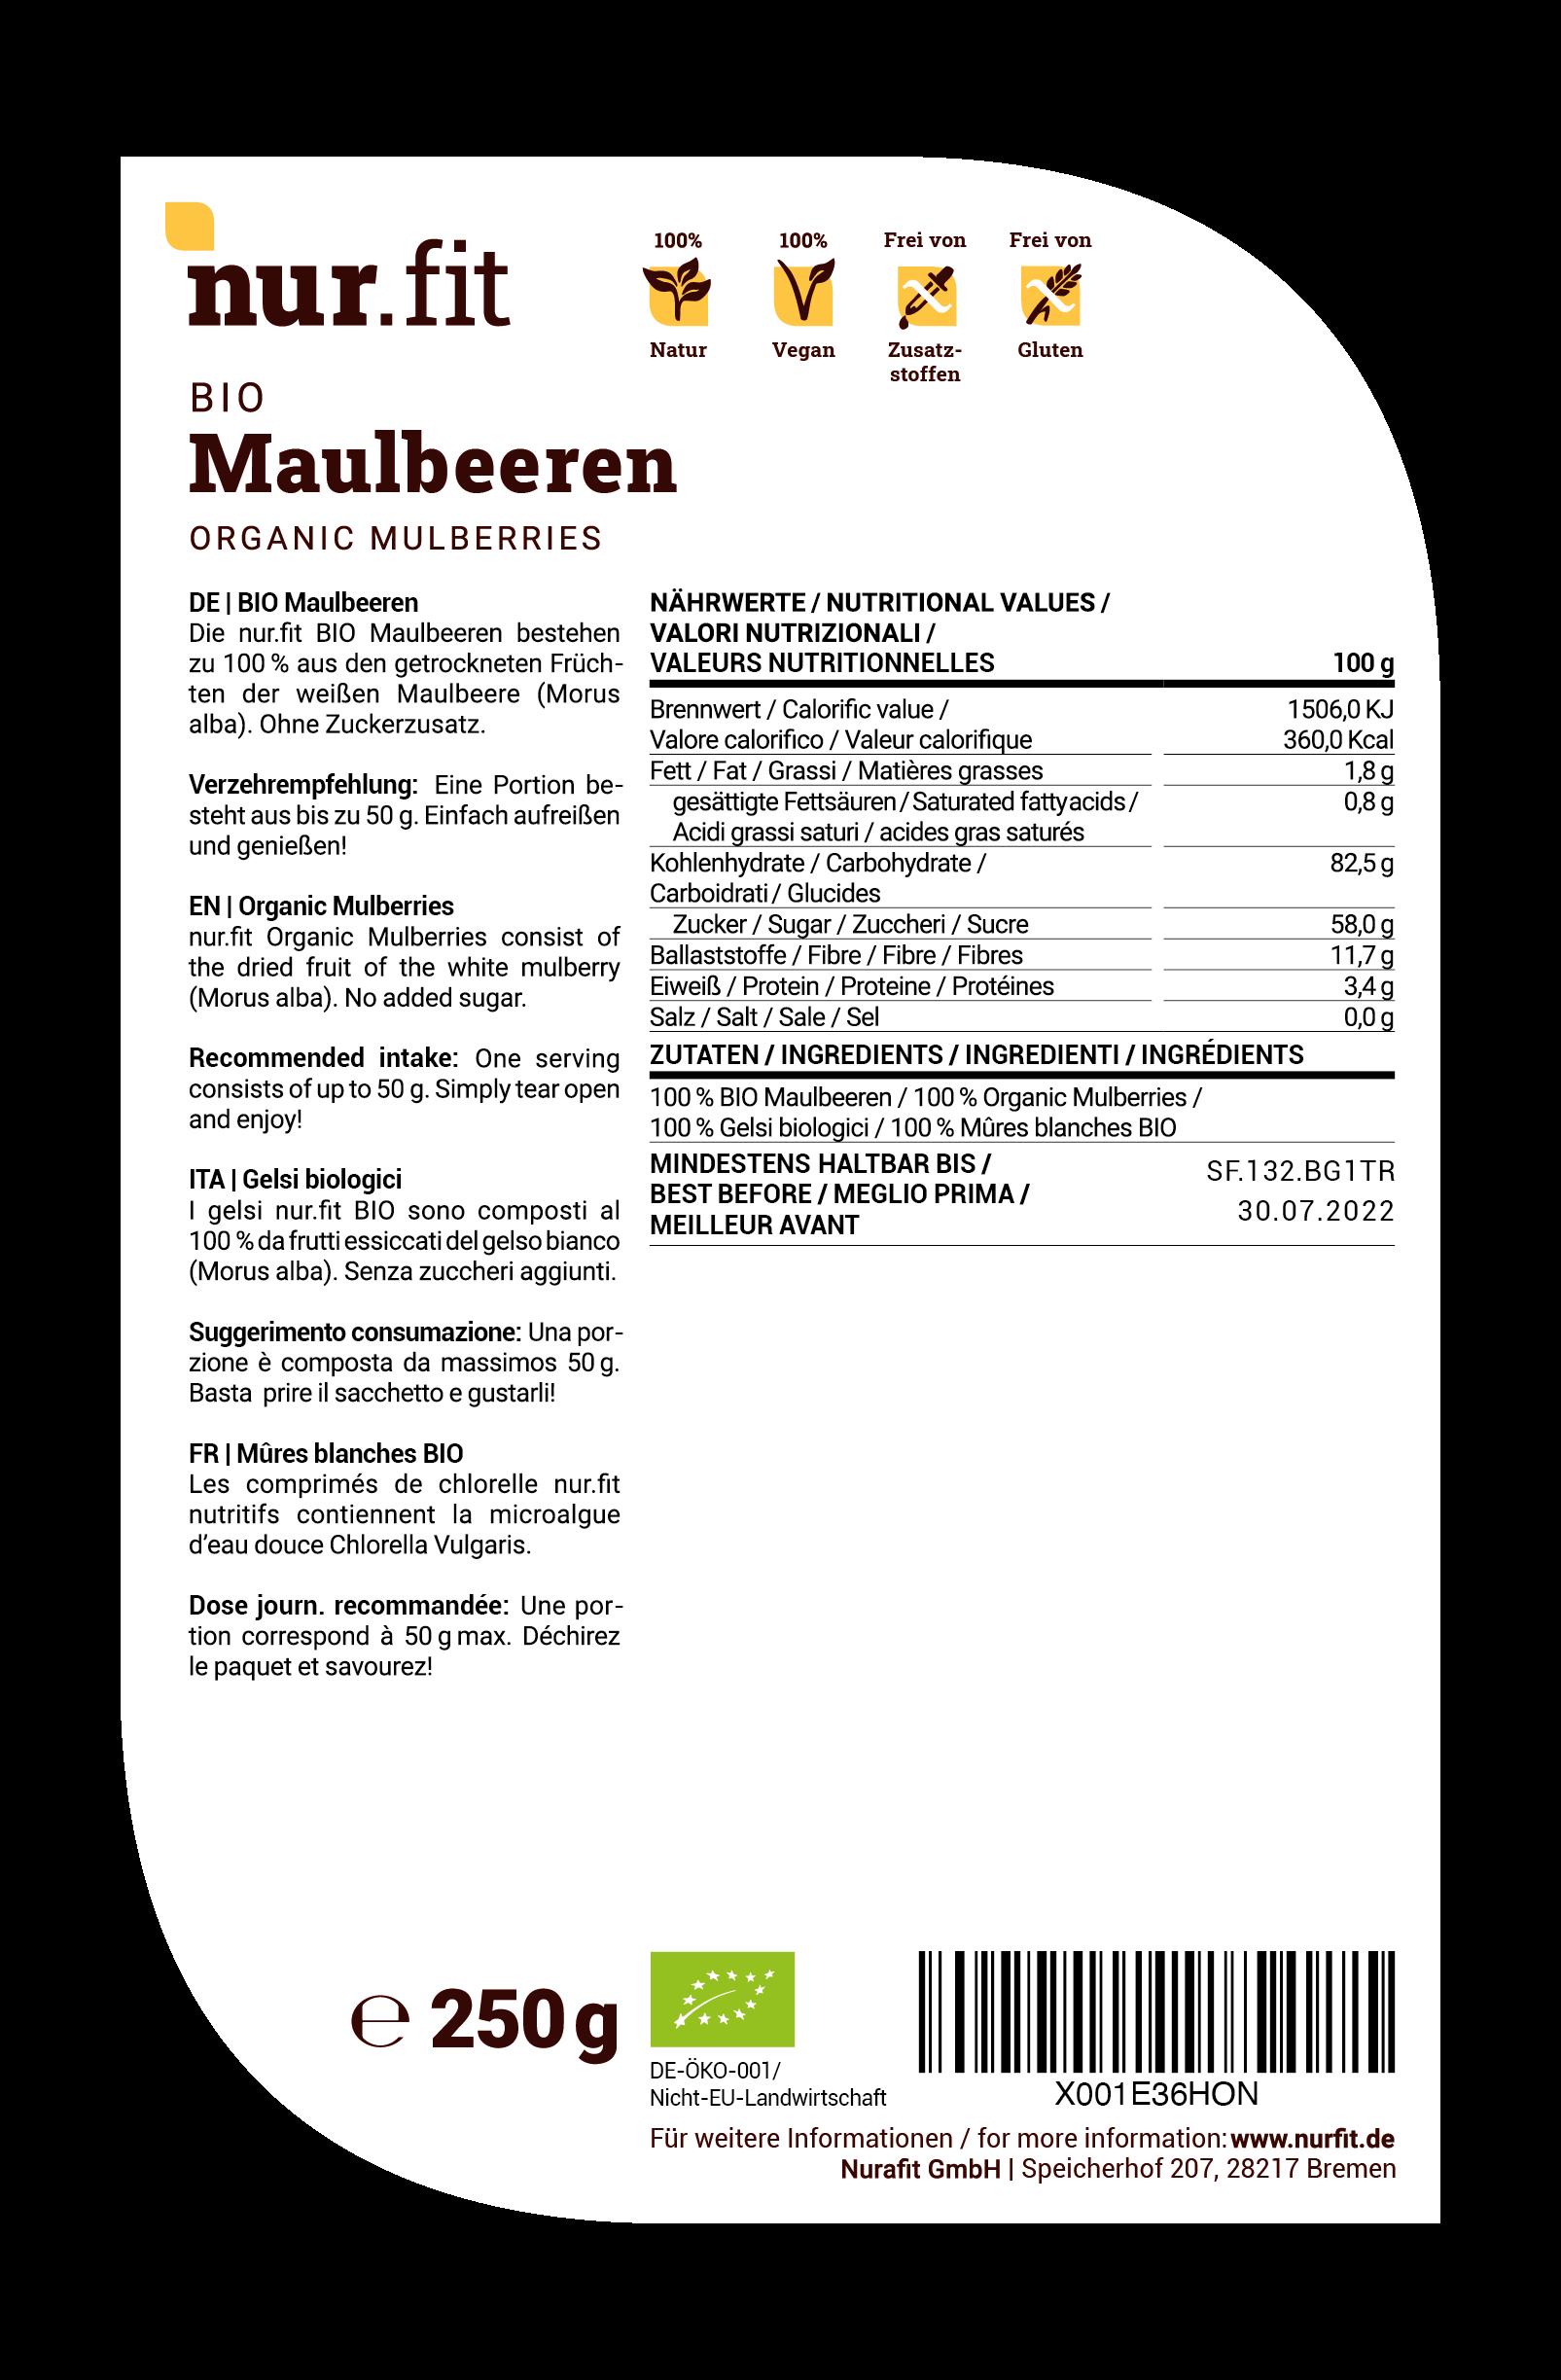 BIO Maulbeeren